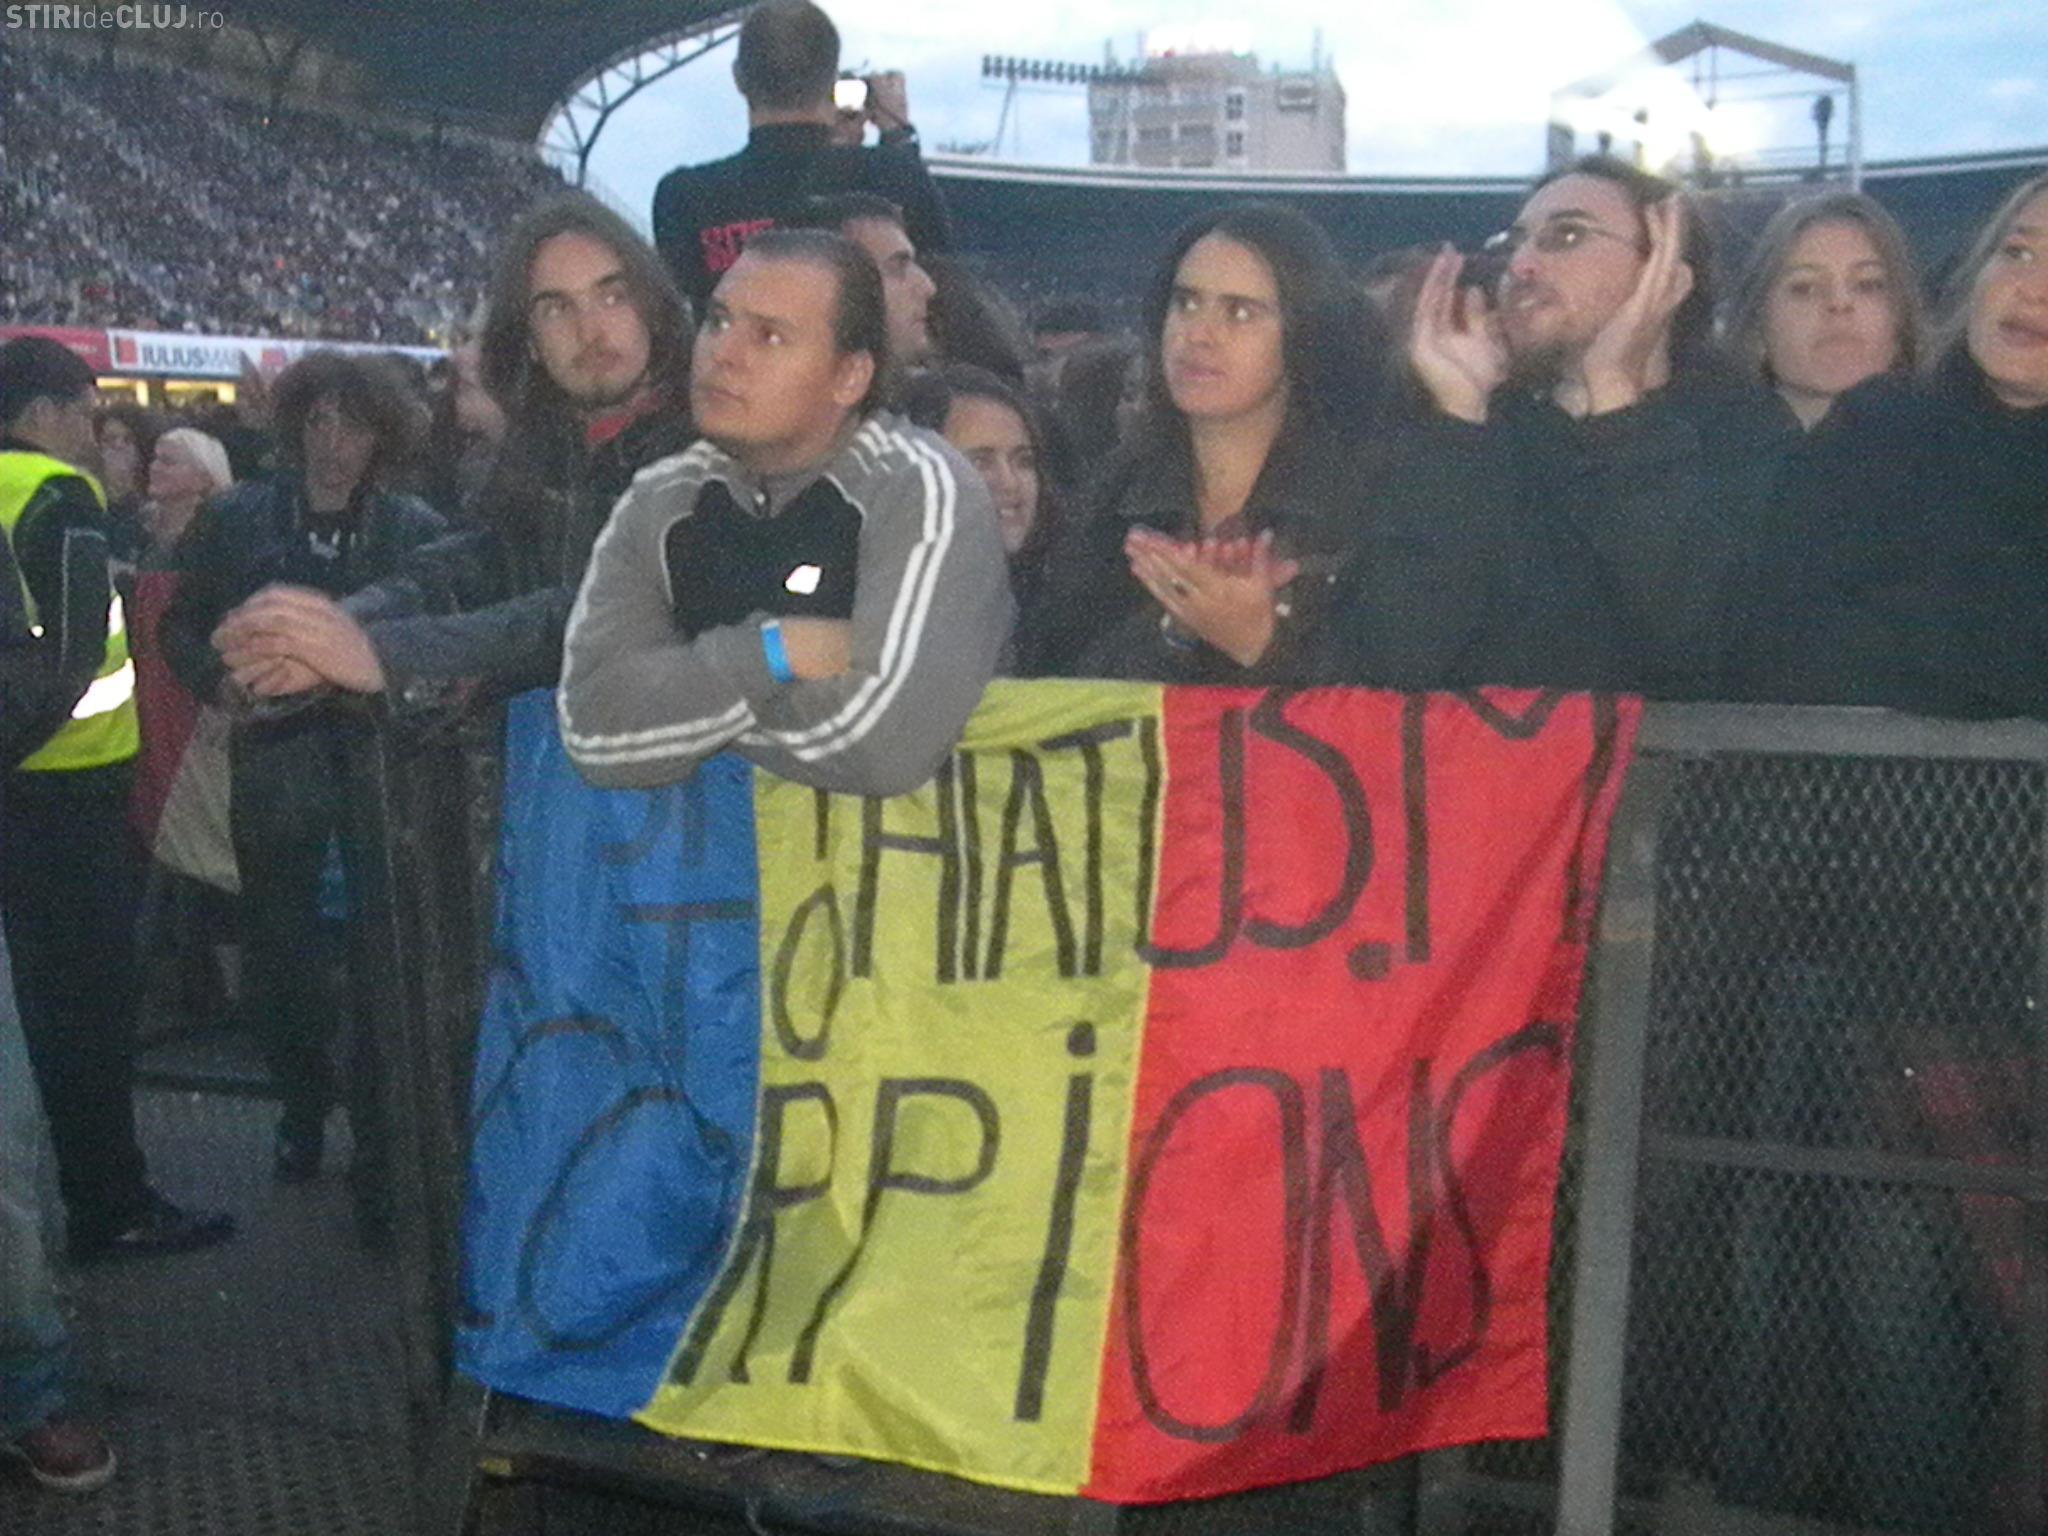 Cluj Arena e plina ochi! Inainte de Scorpions au cantat Semnal M, Sensor si Pacifica VIDEO SPECTACULOS